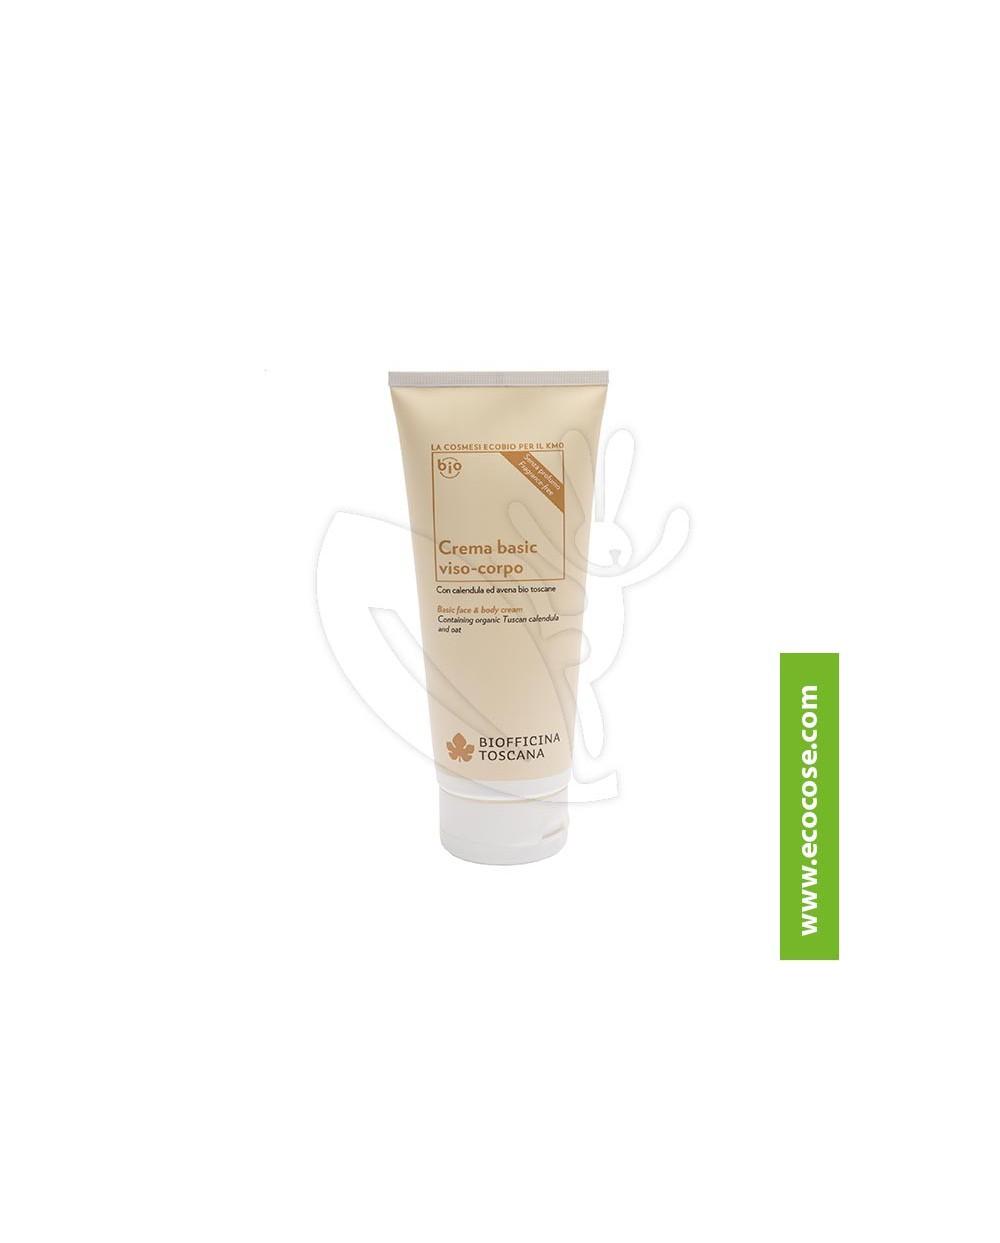 Biofficina Toscana - Crema basic viso-corpo